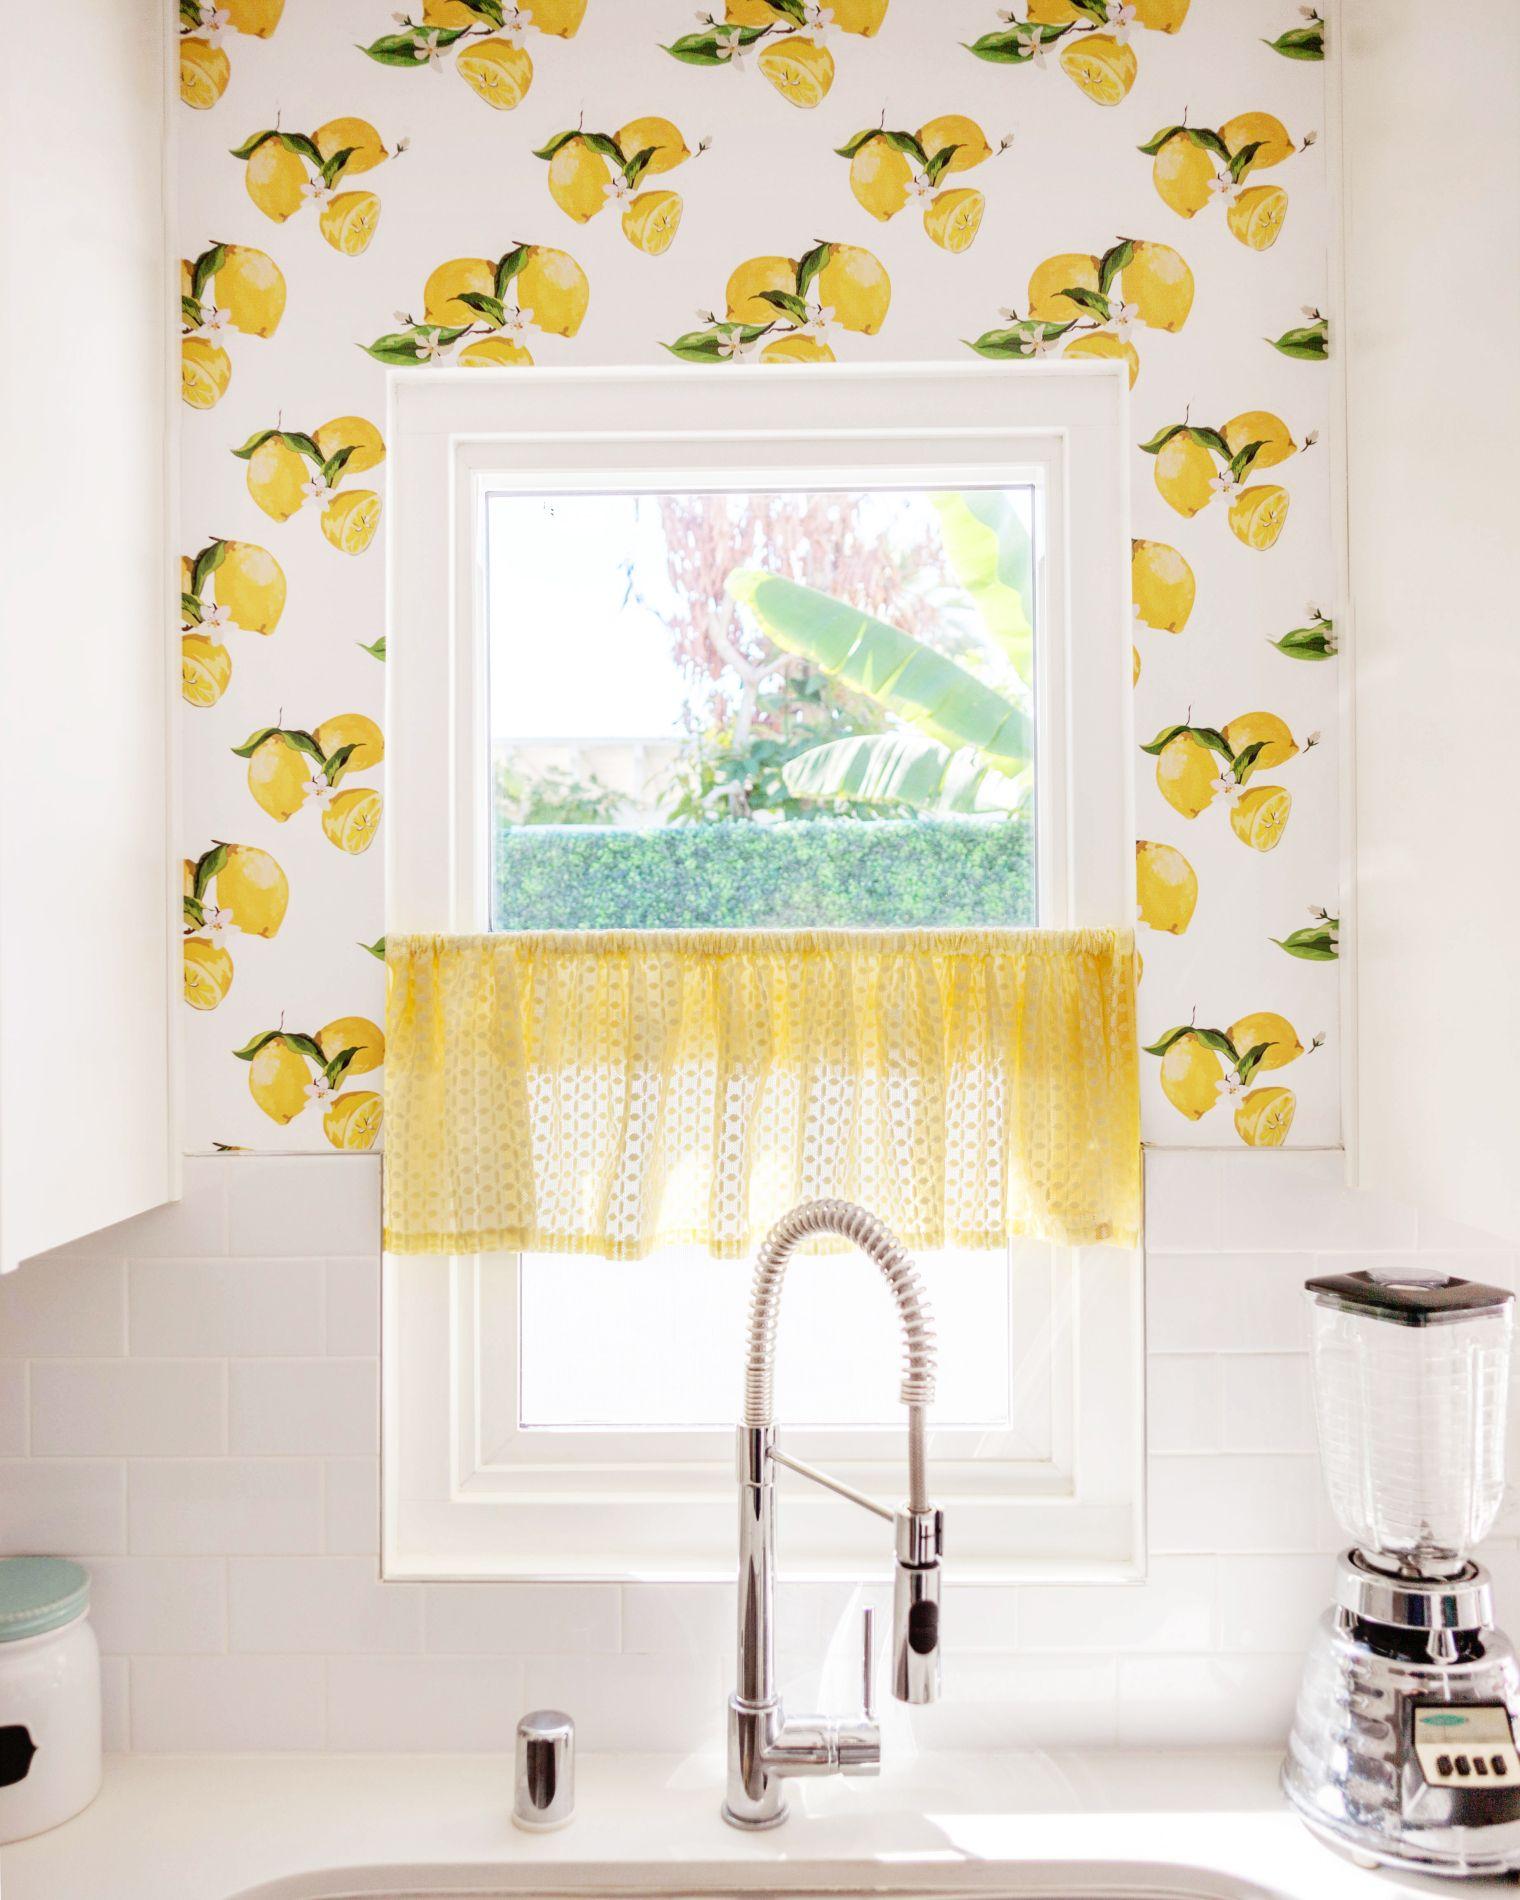 Custom Printed Lemon Peel And Stick Wallpaper From